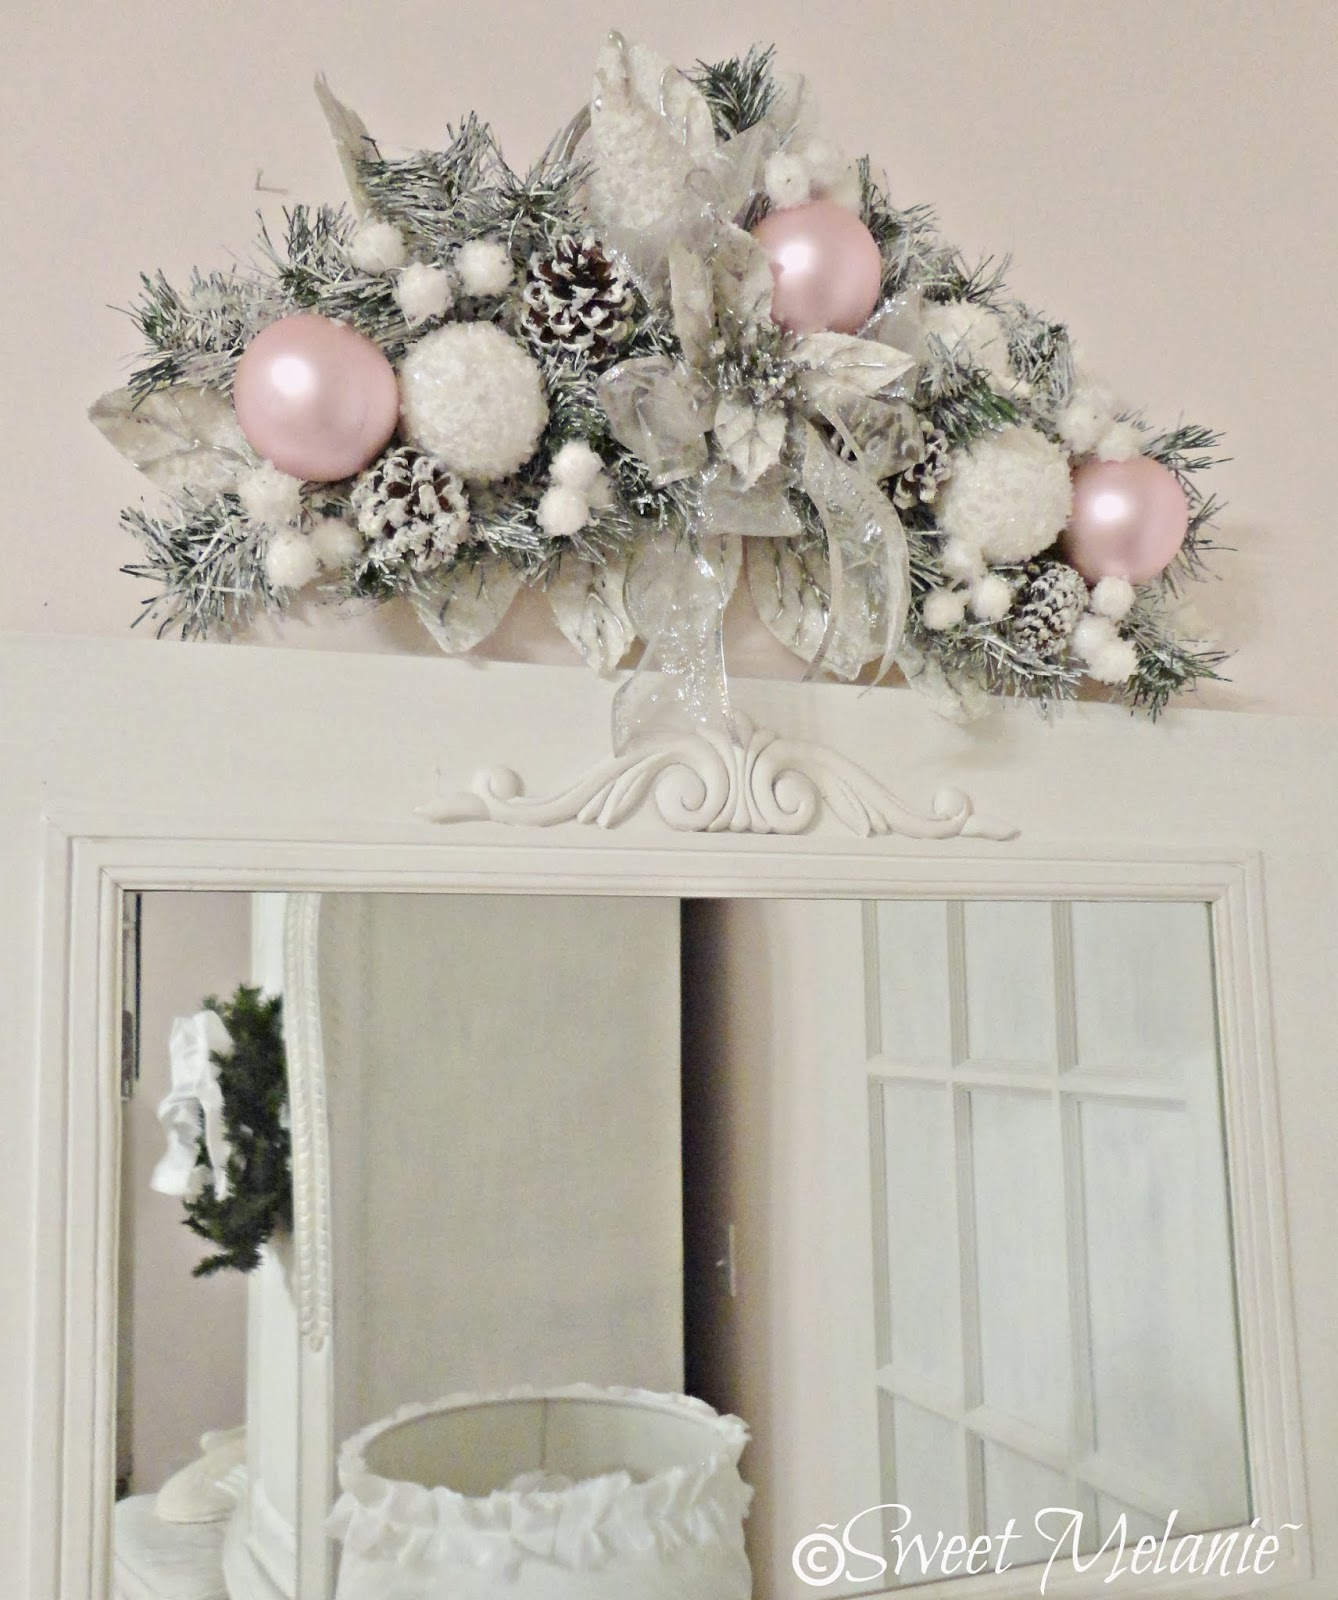 Olivia's Romantic Home: Sweet Melanie's Christmas Home Tour